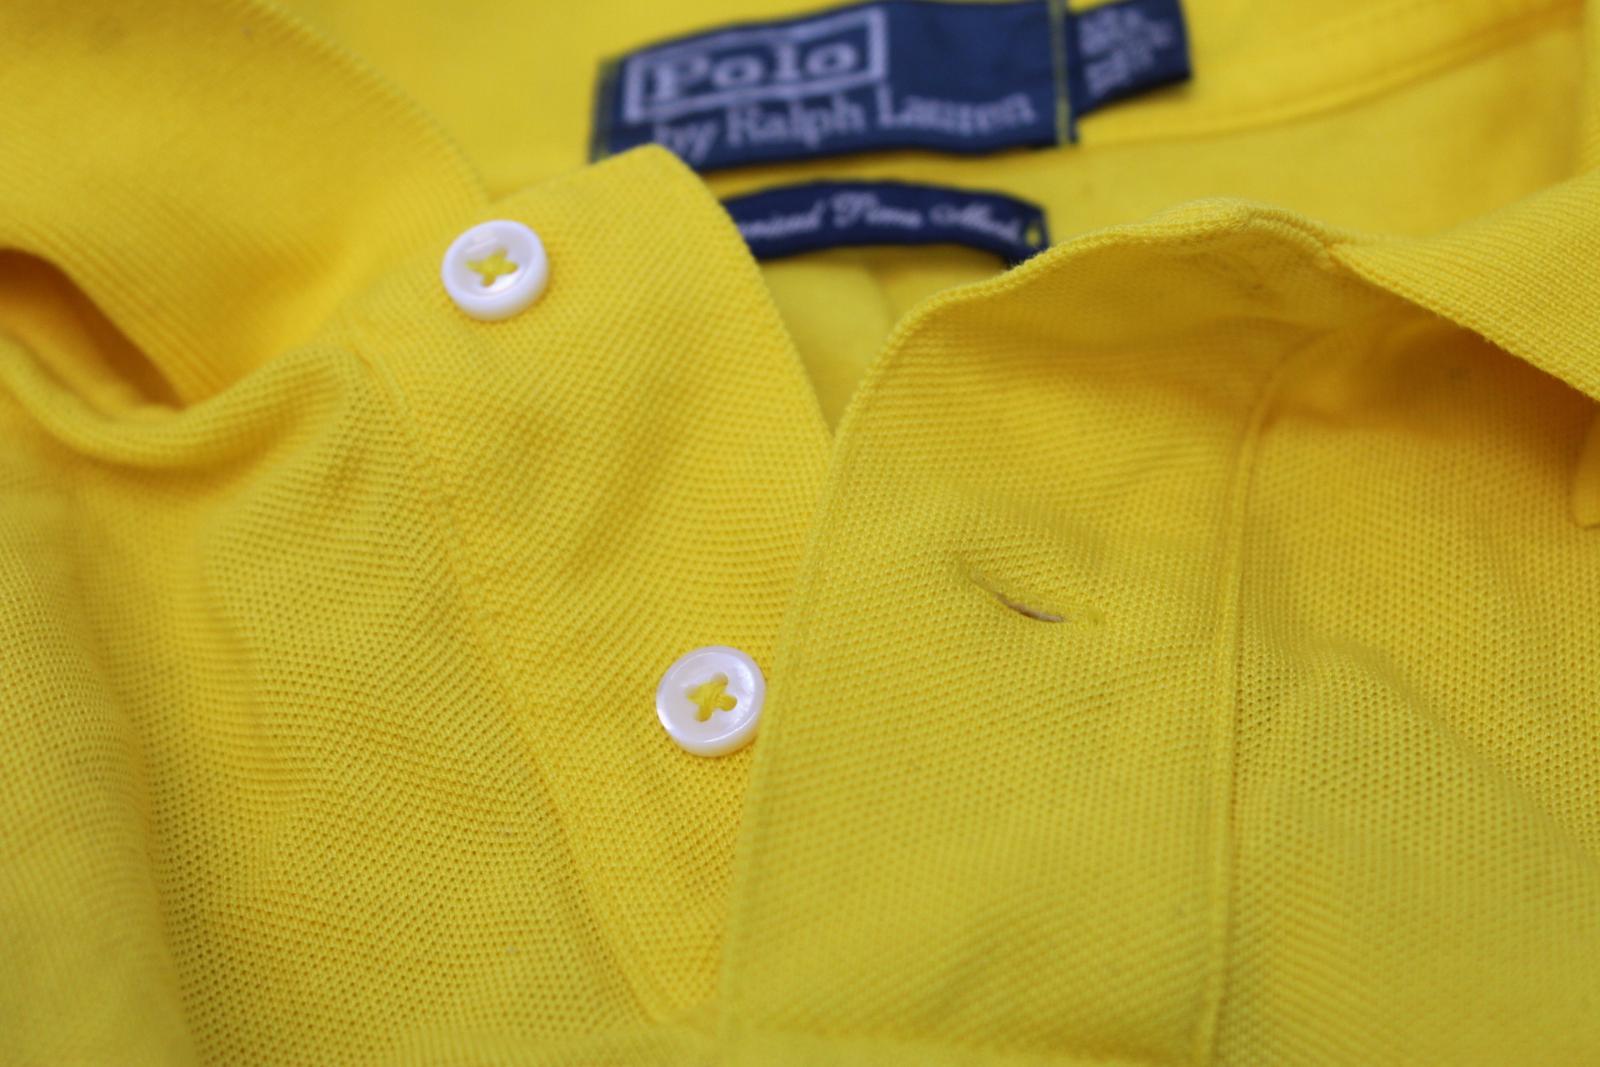 Ralph-Lauren-Polo-para-hombre-de-Amarillo-De-Algodon-Manga-Corta-Camisa-Polo-De-Ajuste-Personalizado miniatura 10